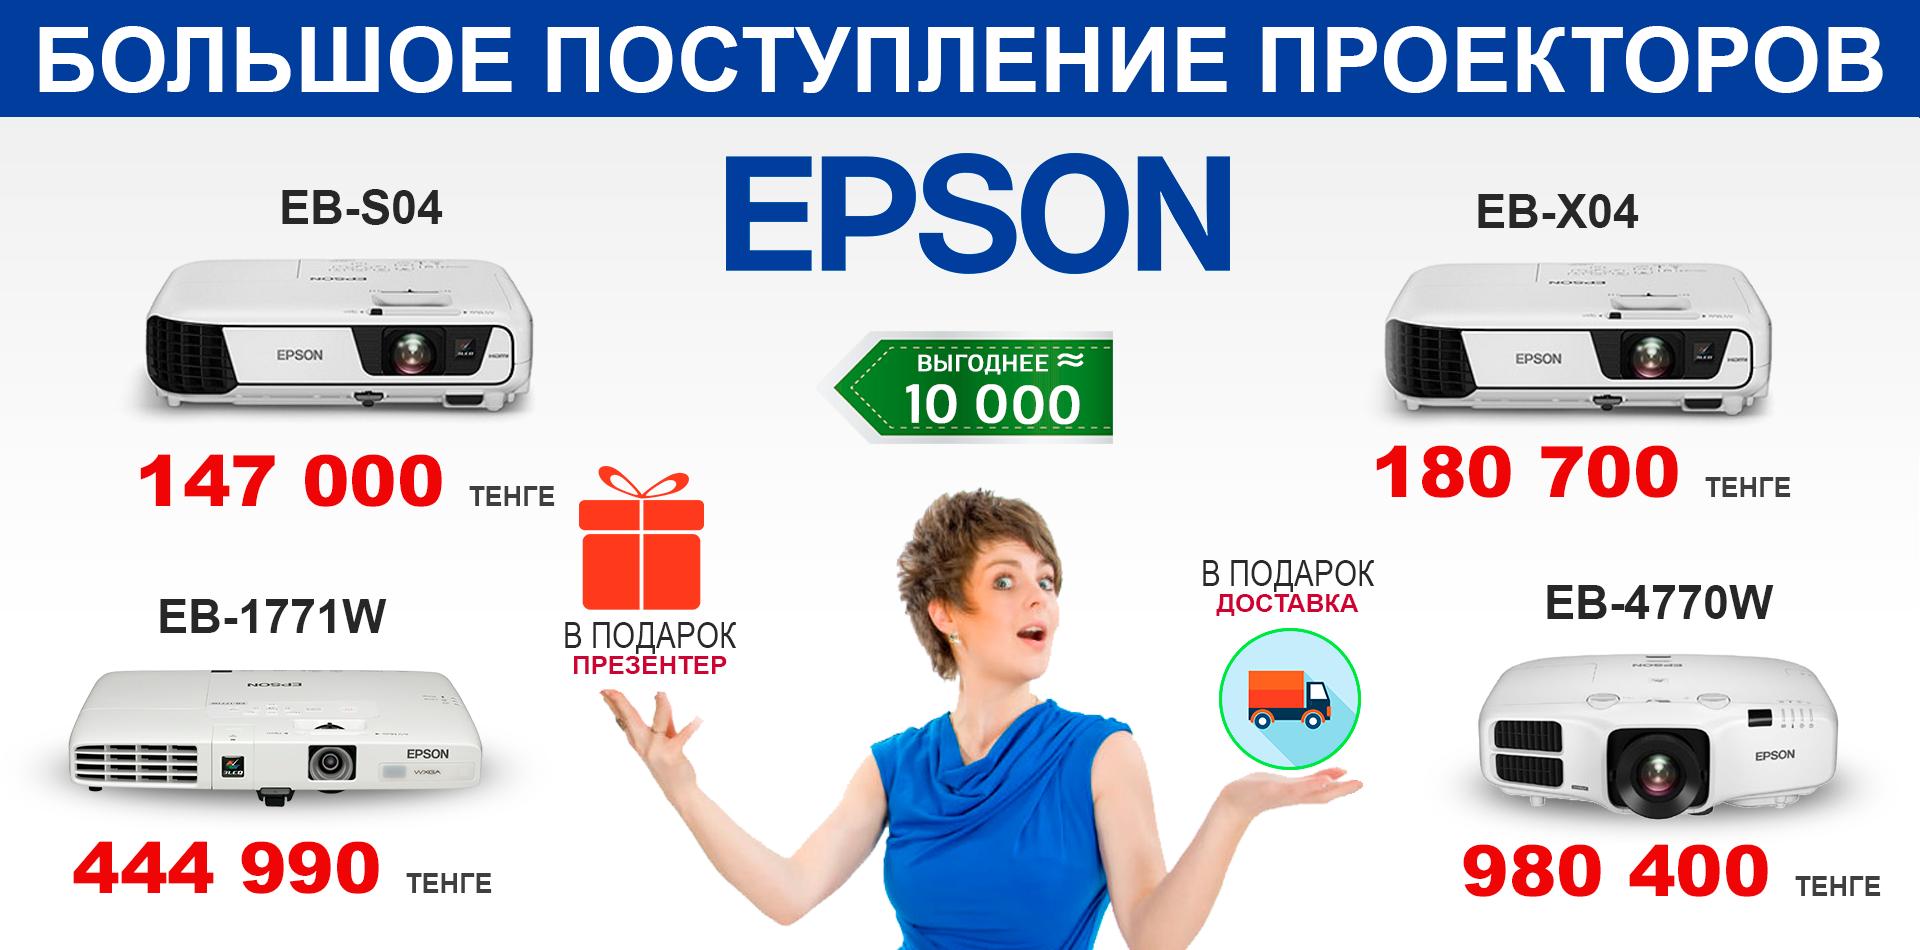 ПРОЕКТОРЫ EPSON